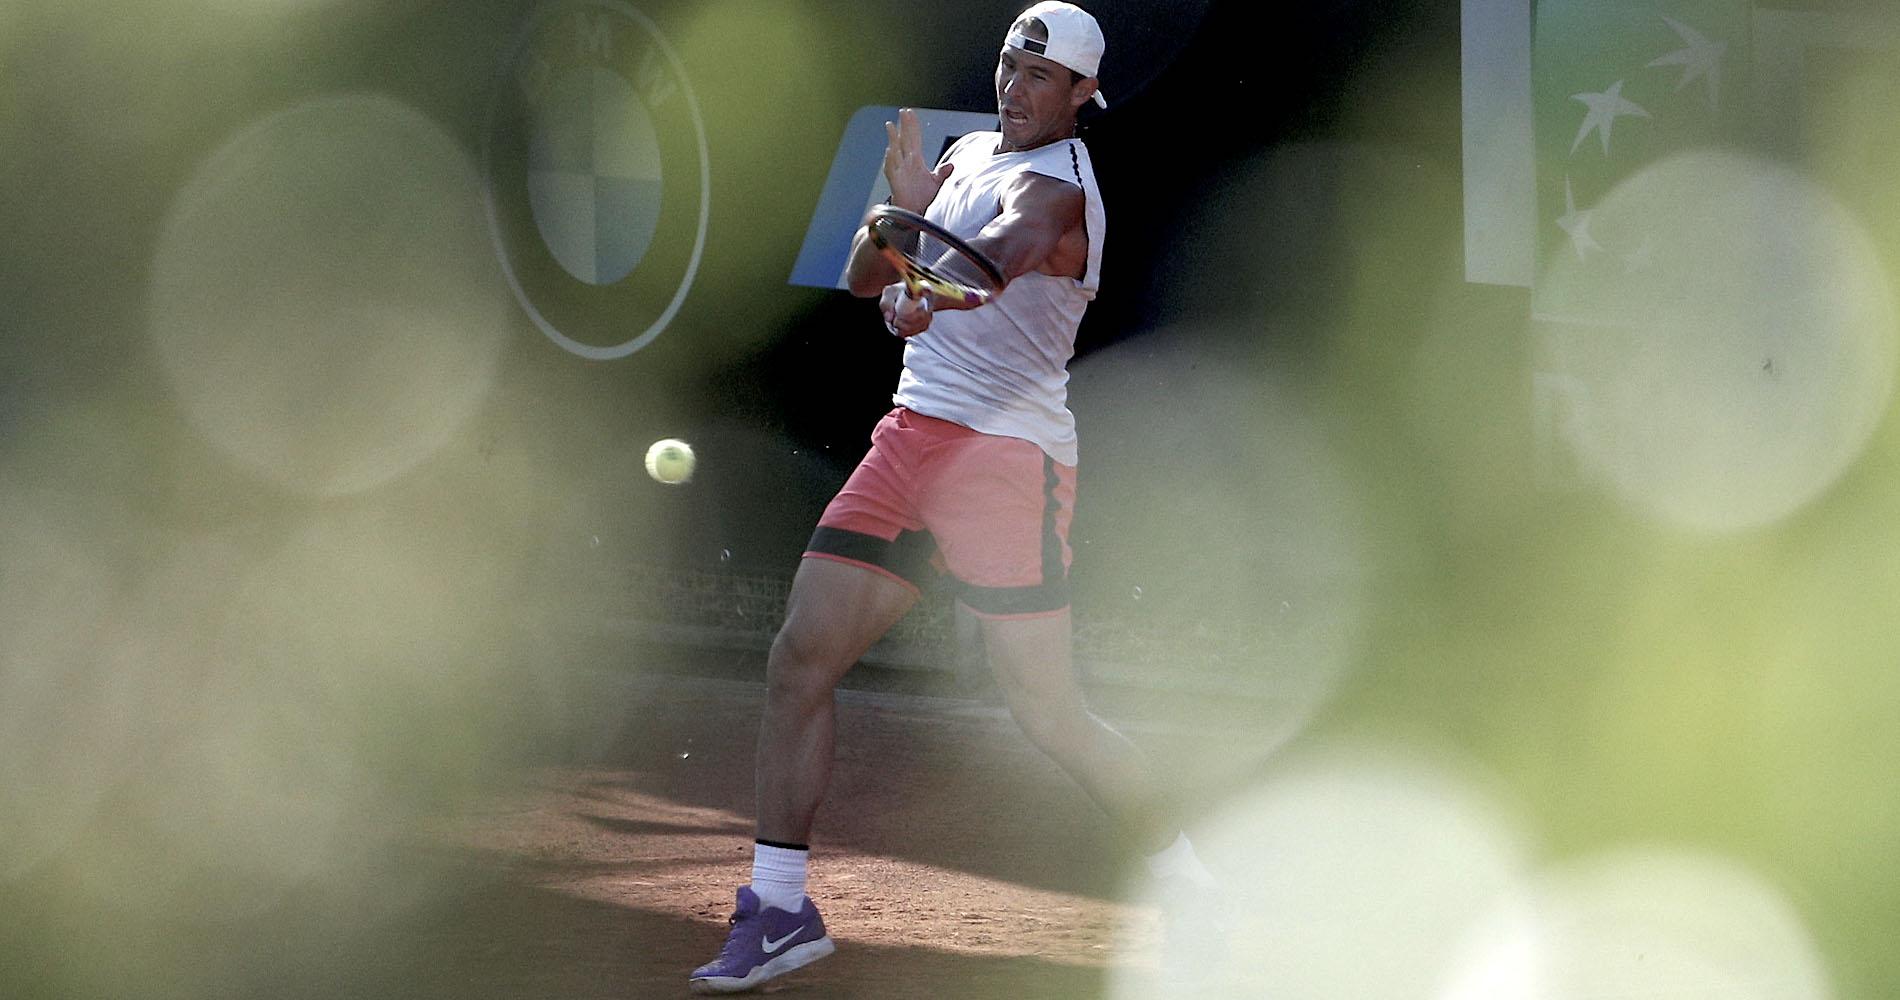 Rafael Nadal in action during training